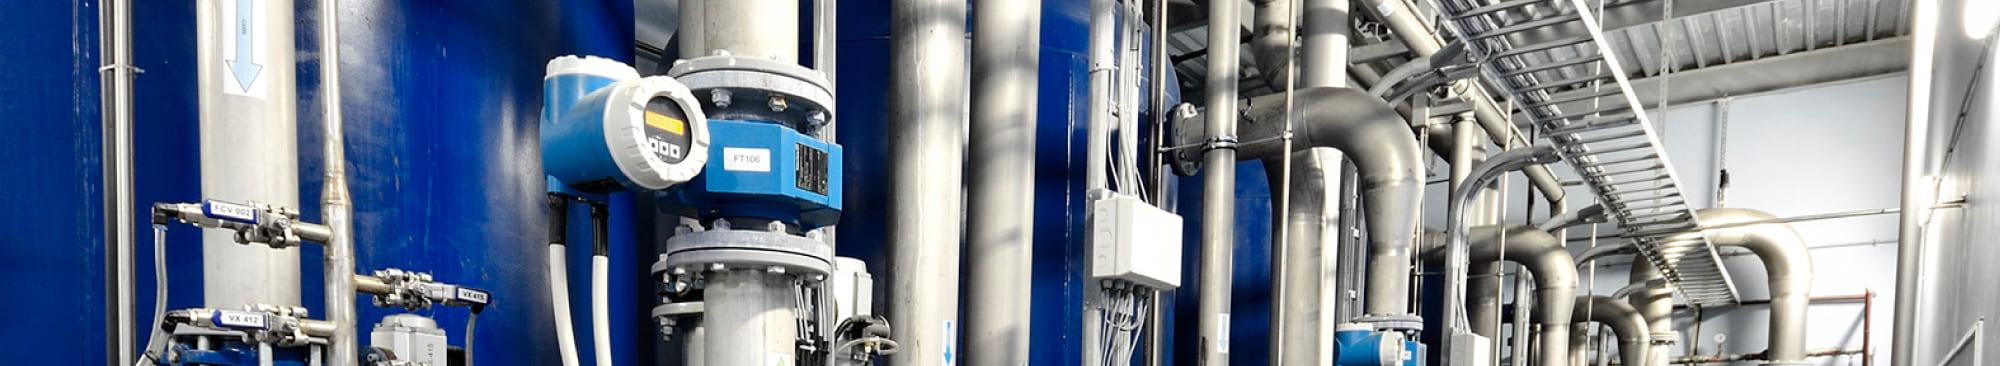 Bespoke Gas Detection in Boiler Rooms